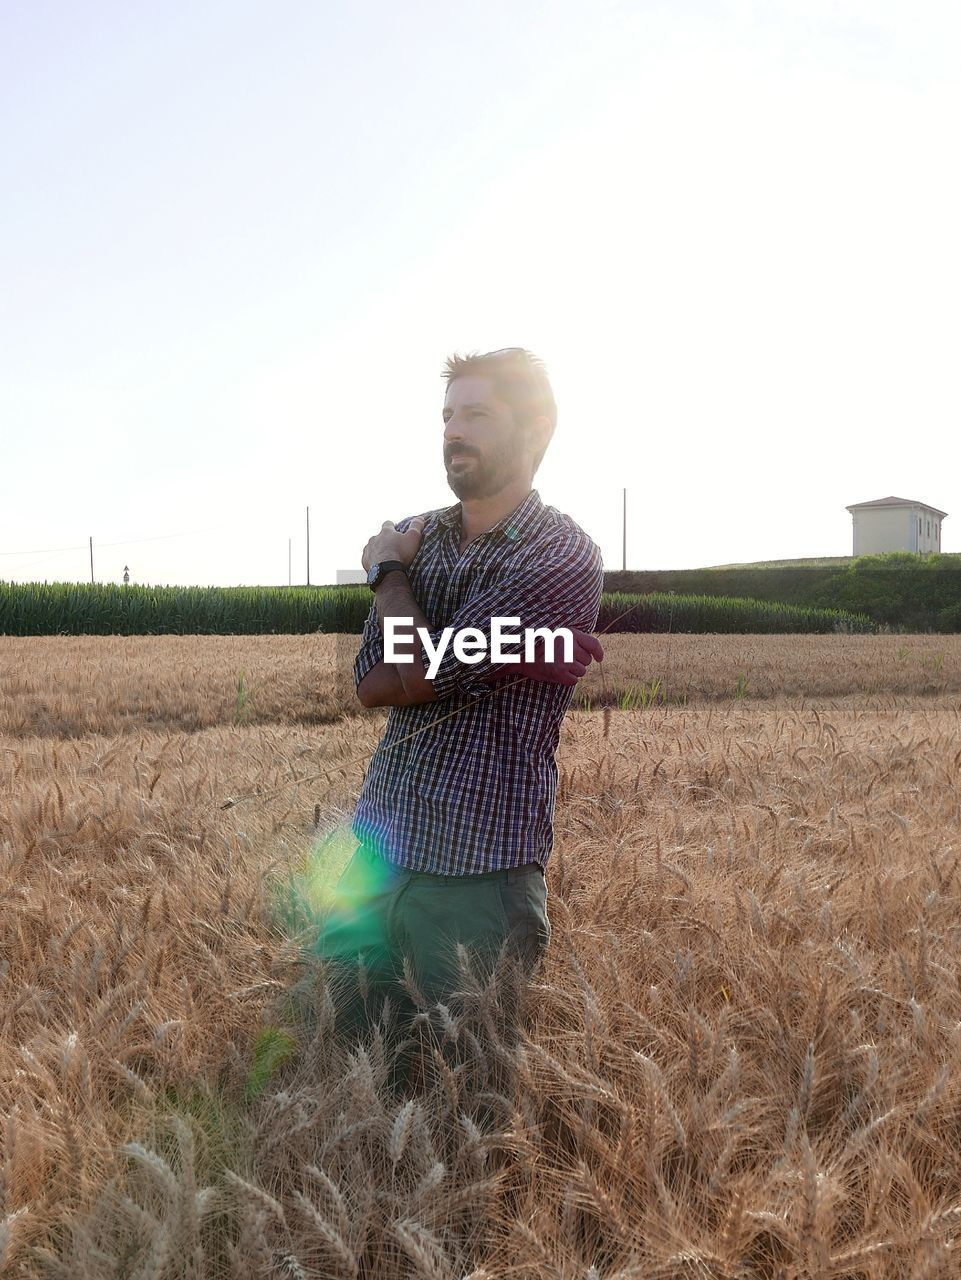 Man working in farm against clear sky